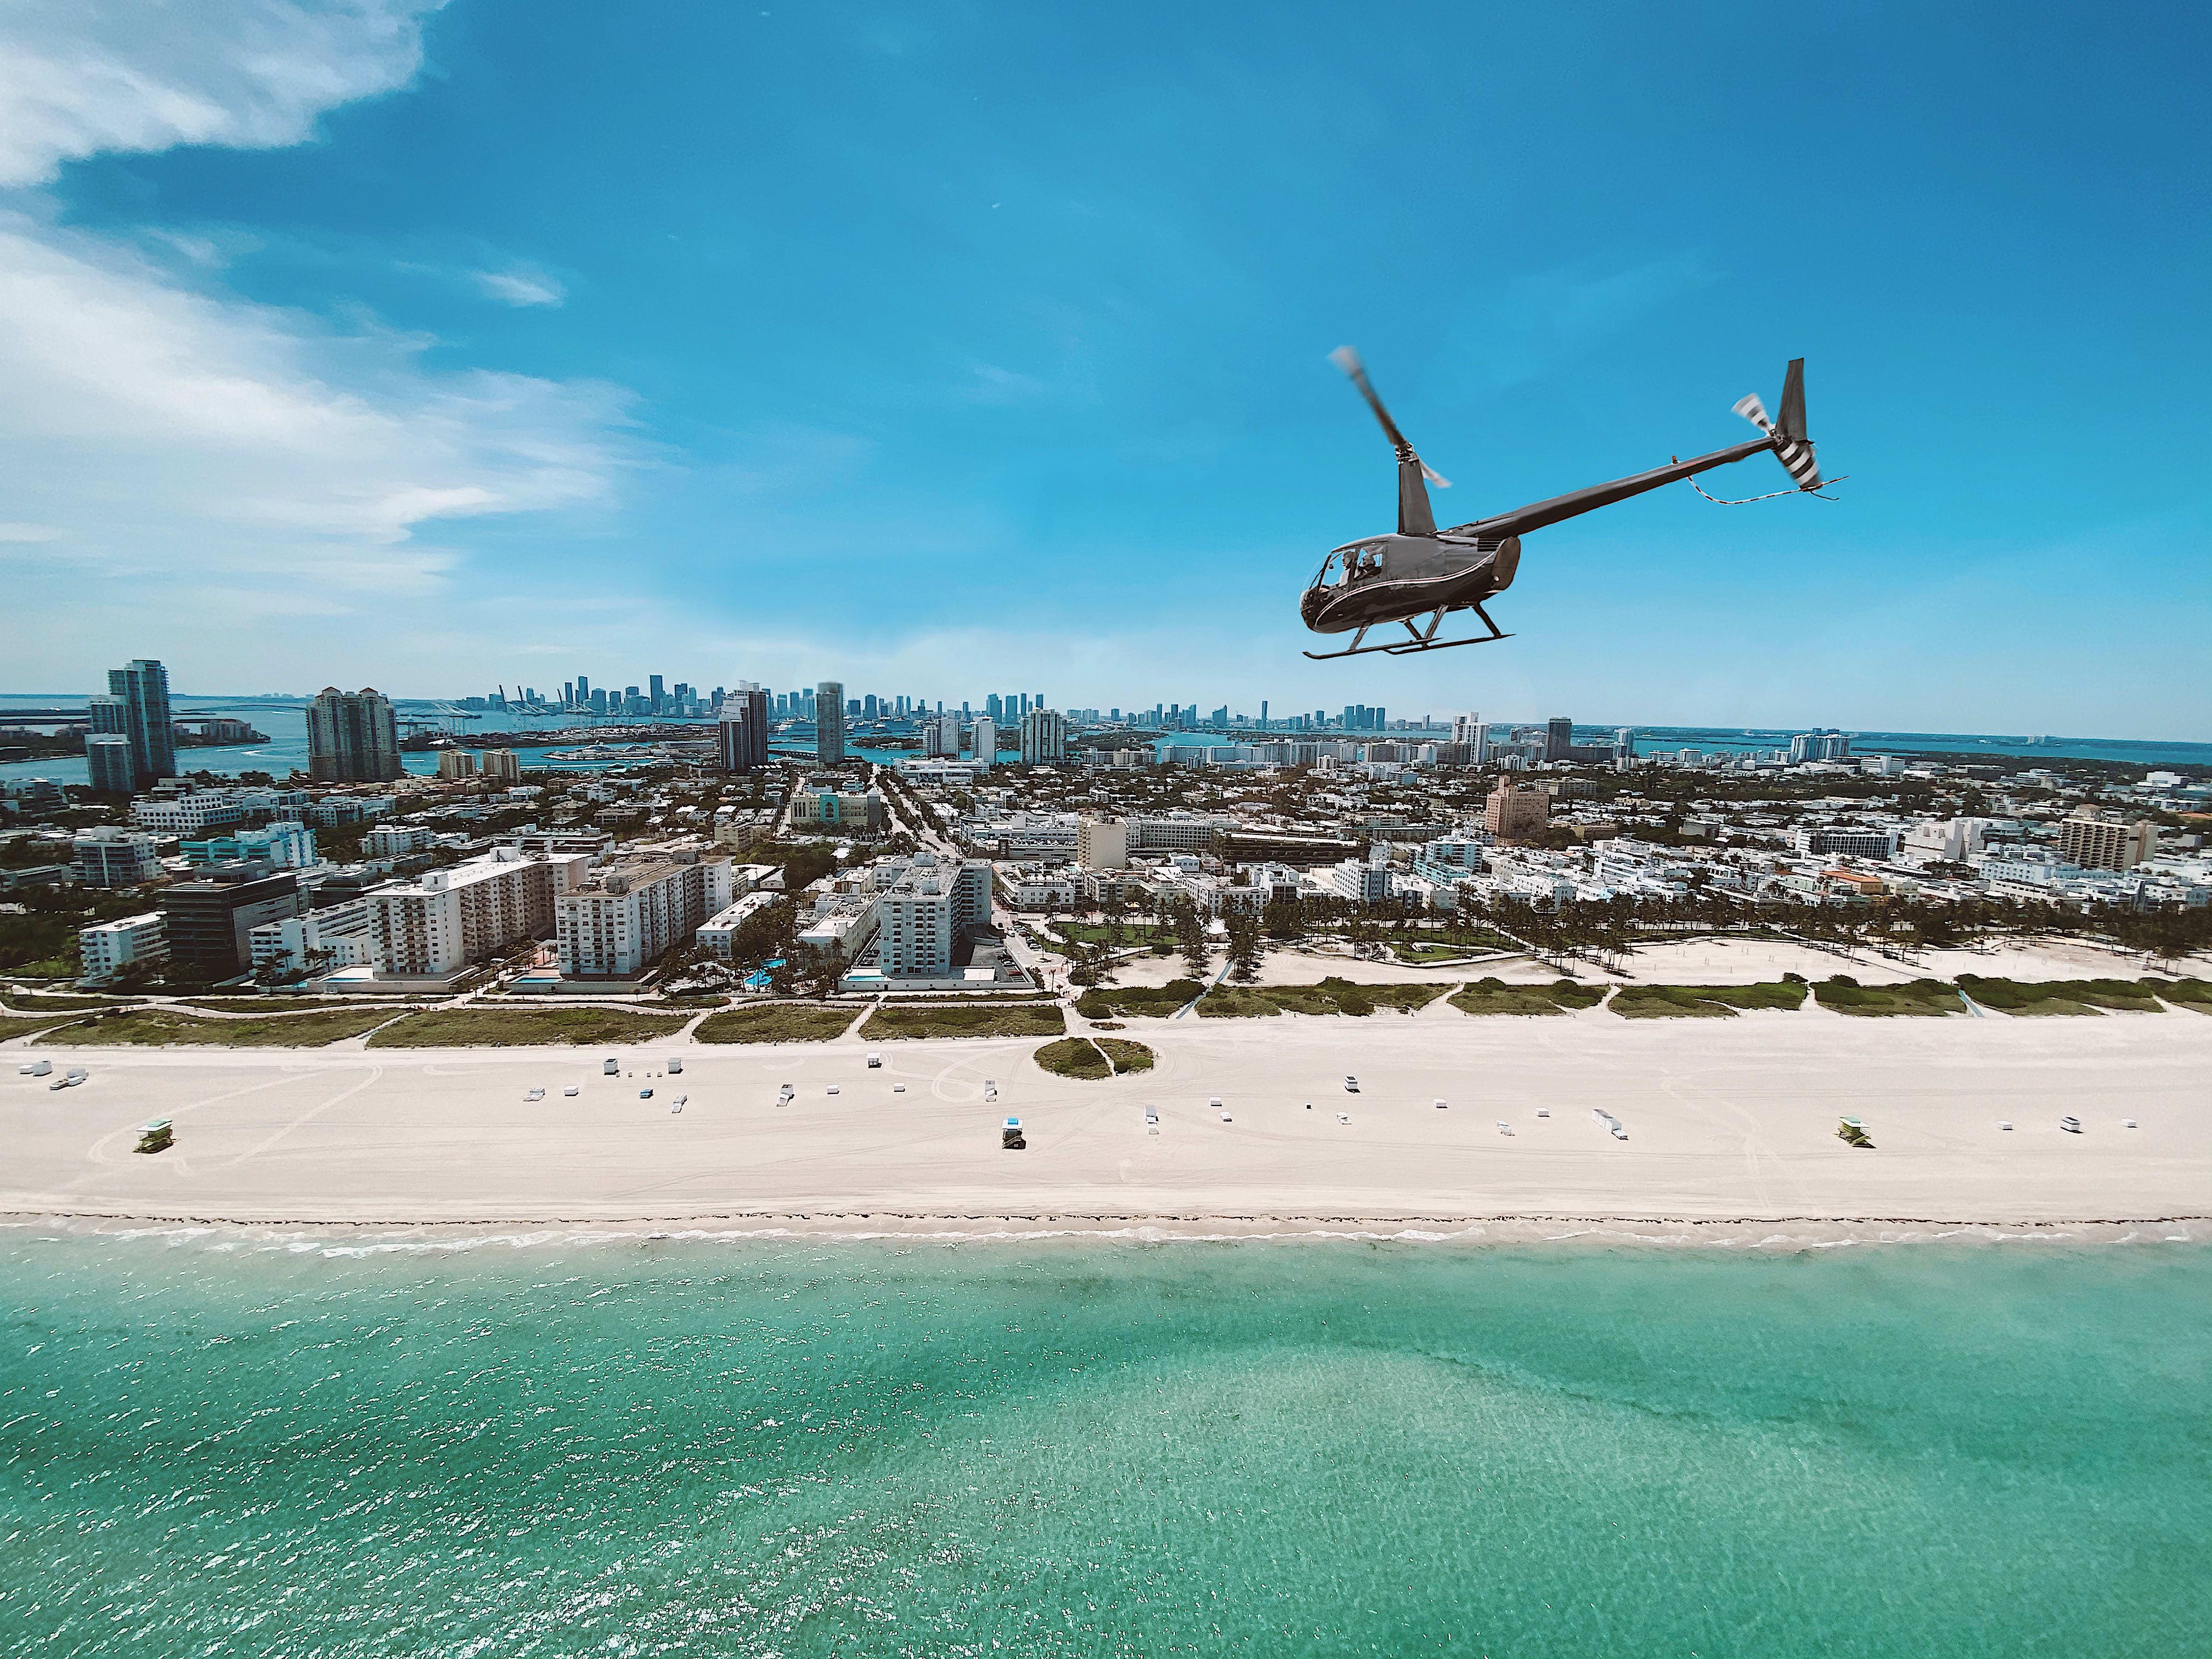 South Beach Fly By